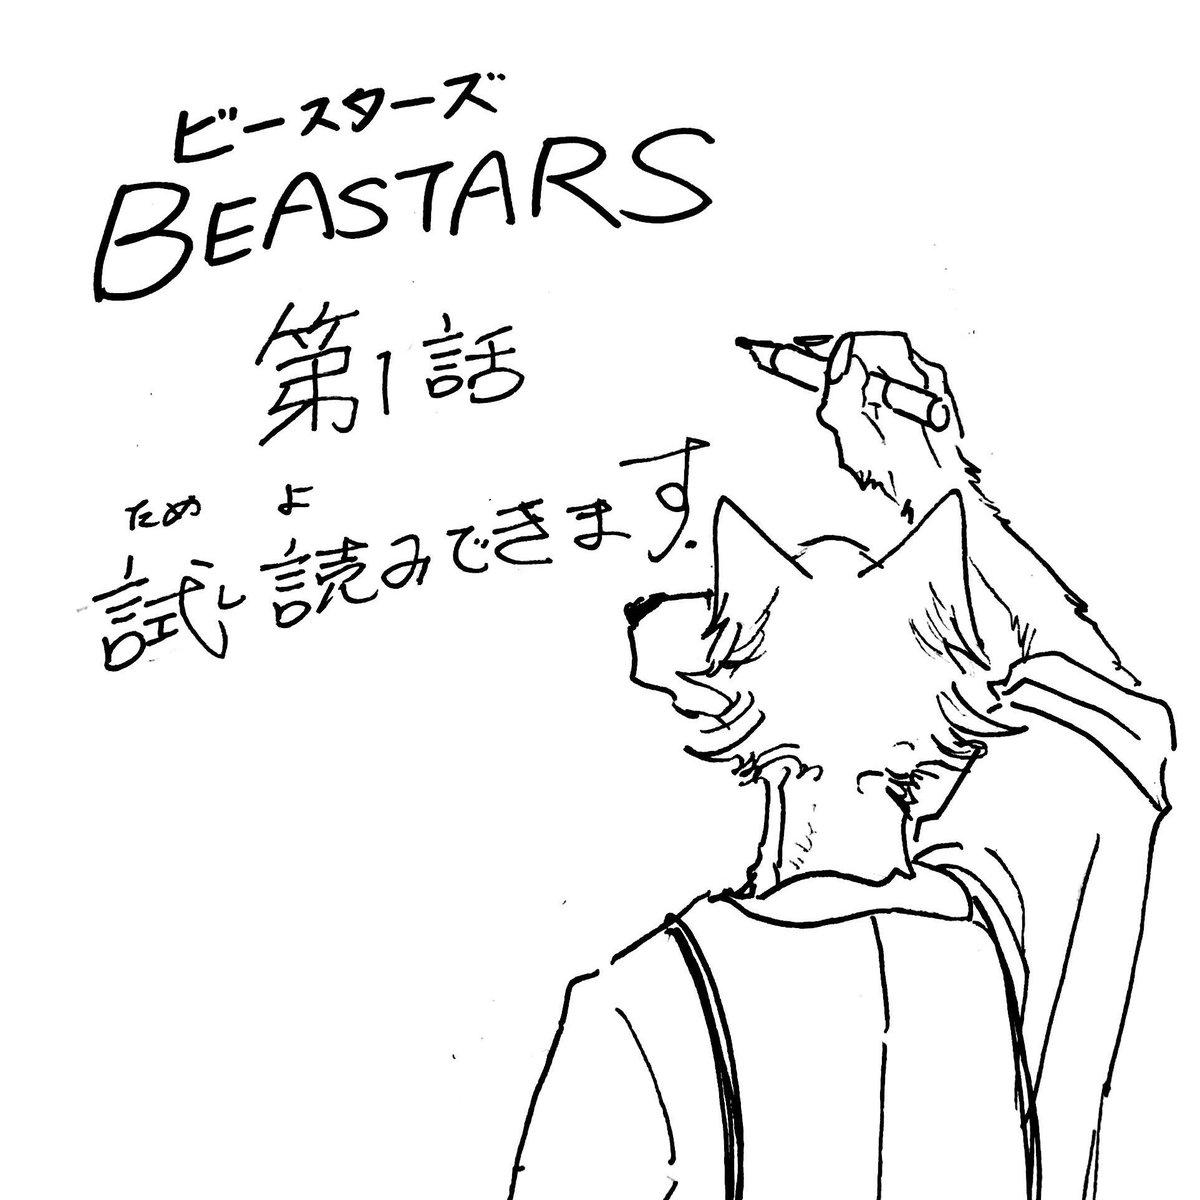 「BEASTARS」の画像検索結果